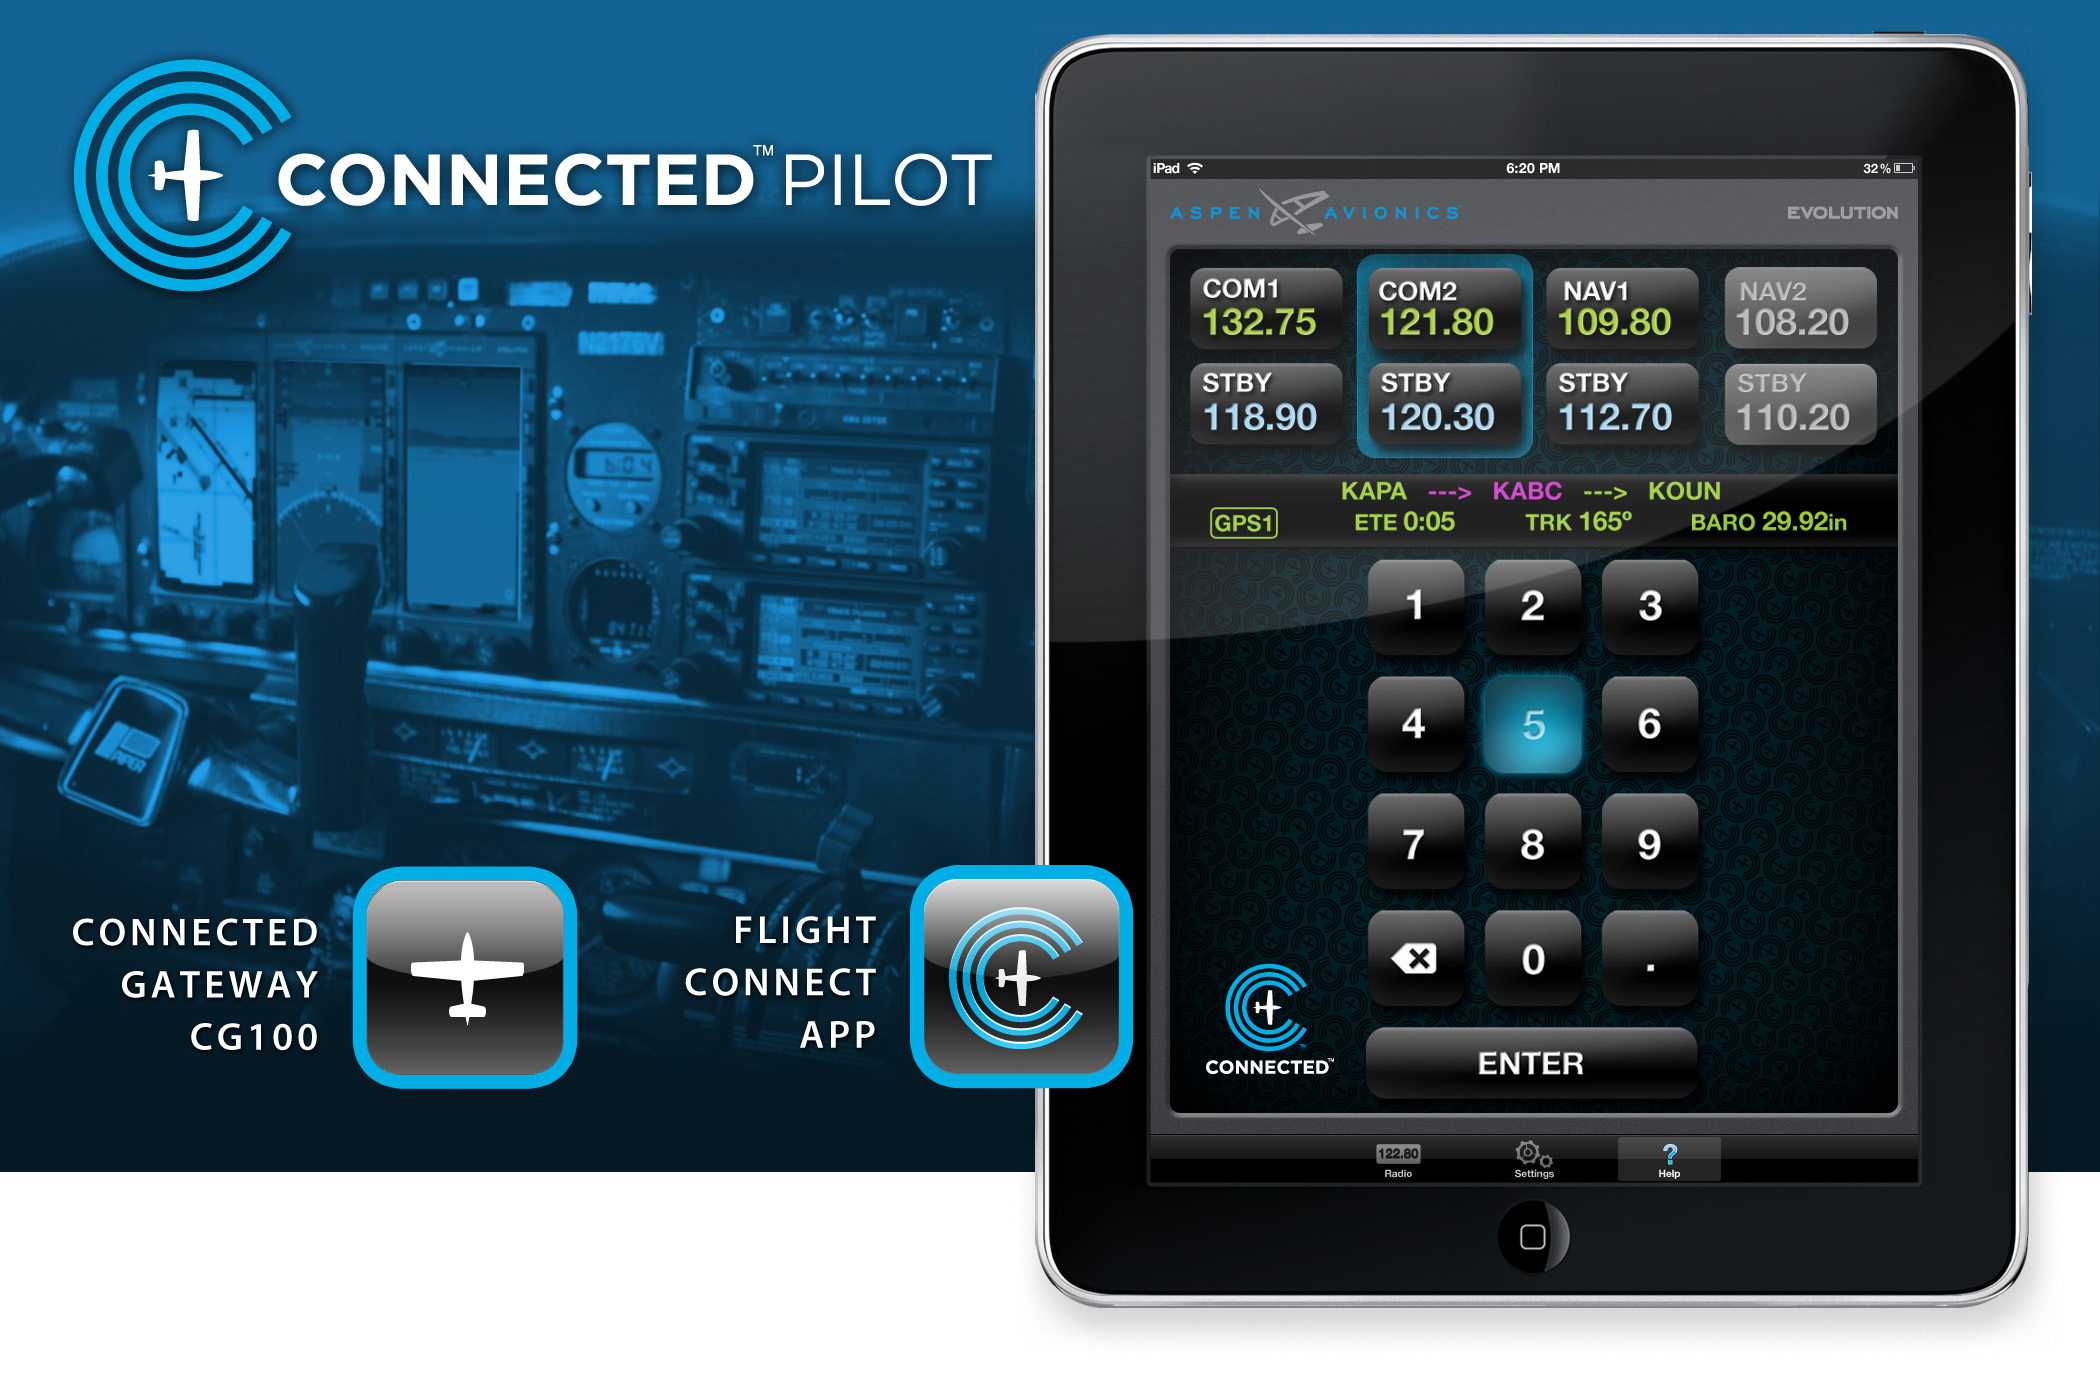 aspen avionics 1000 vfr pdf